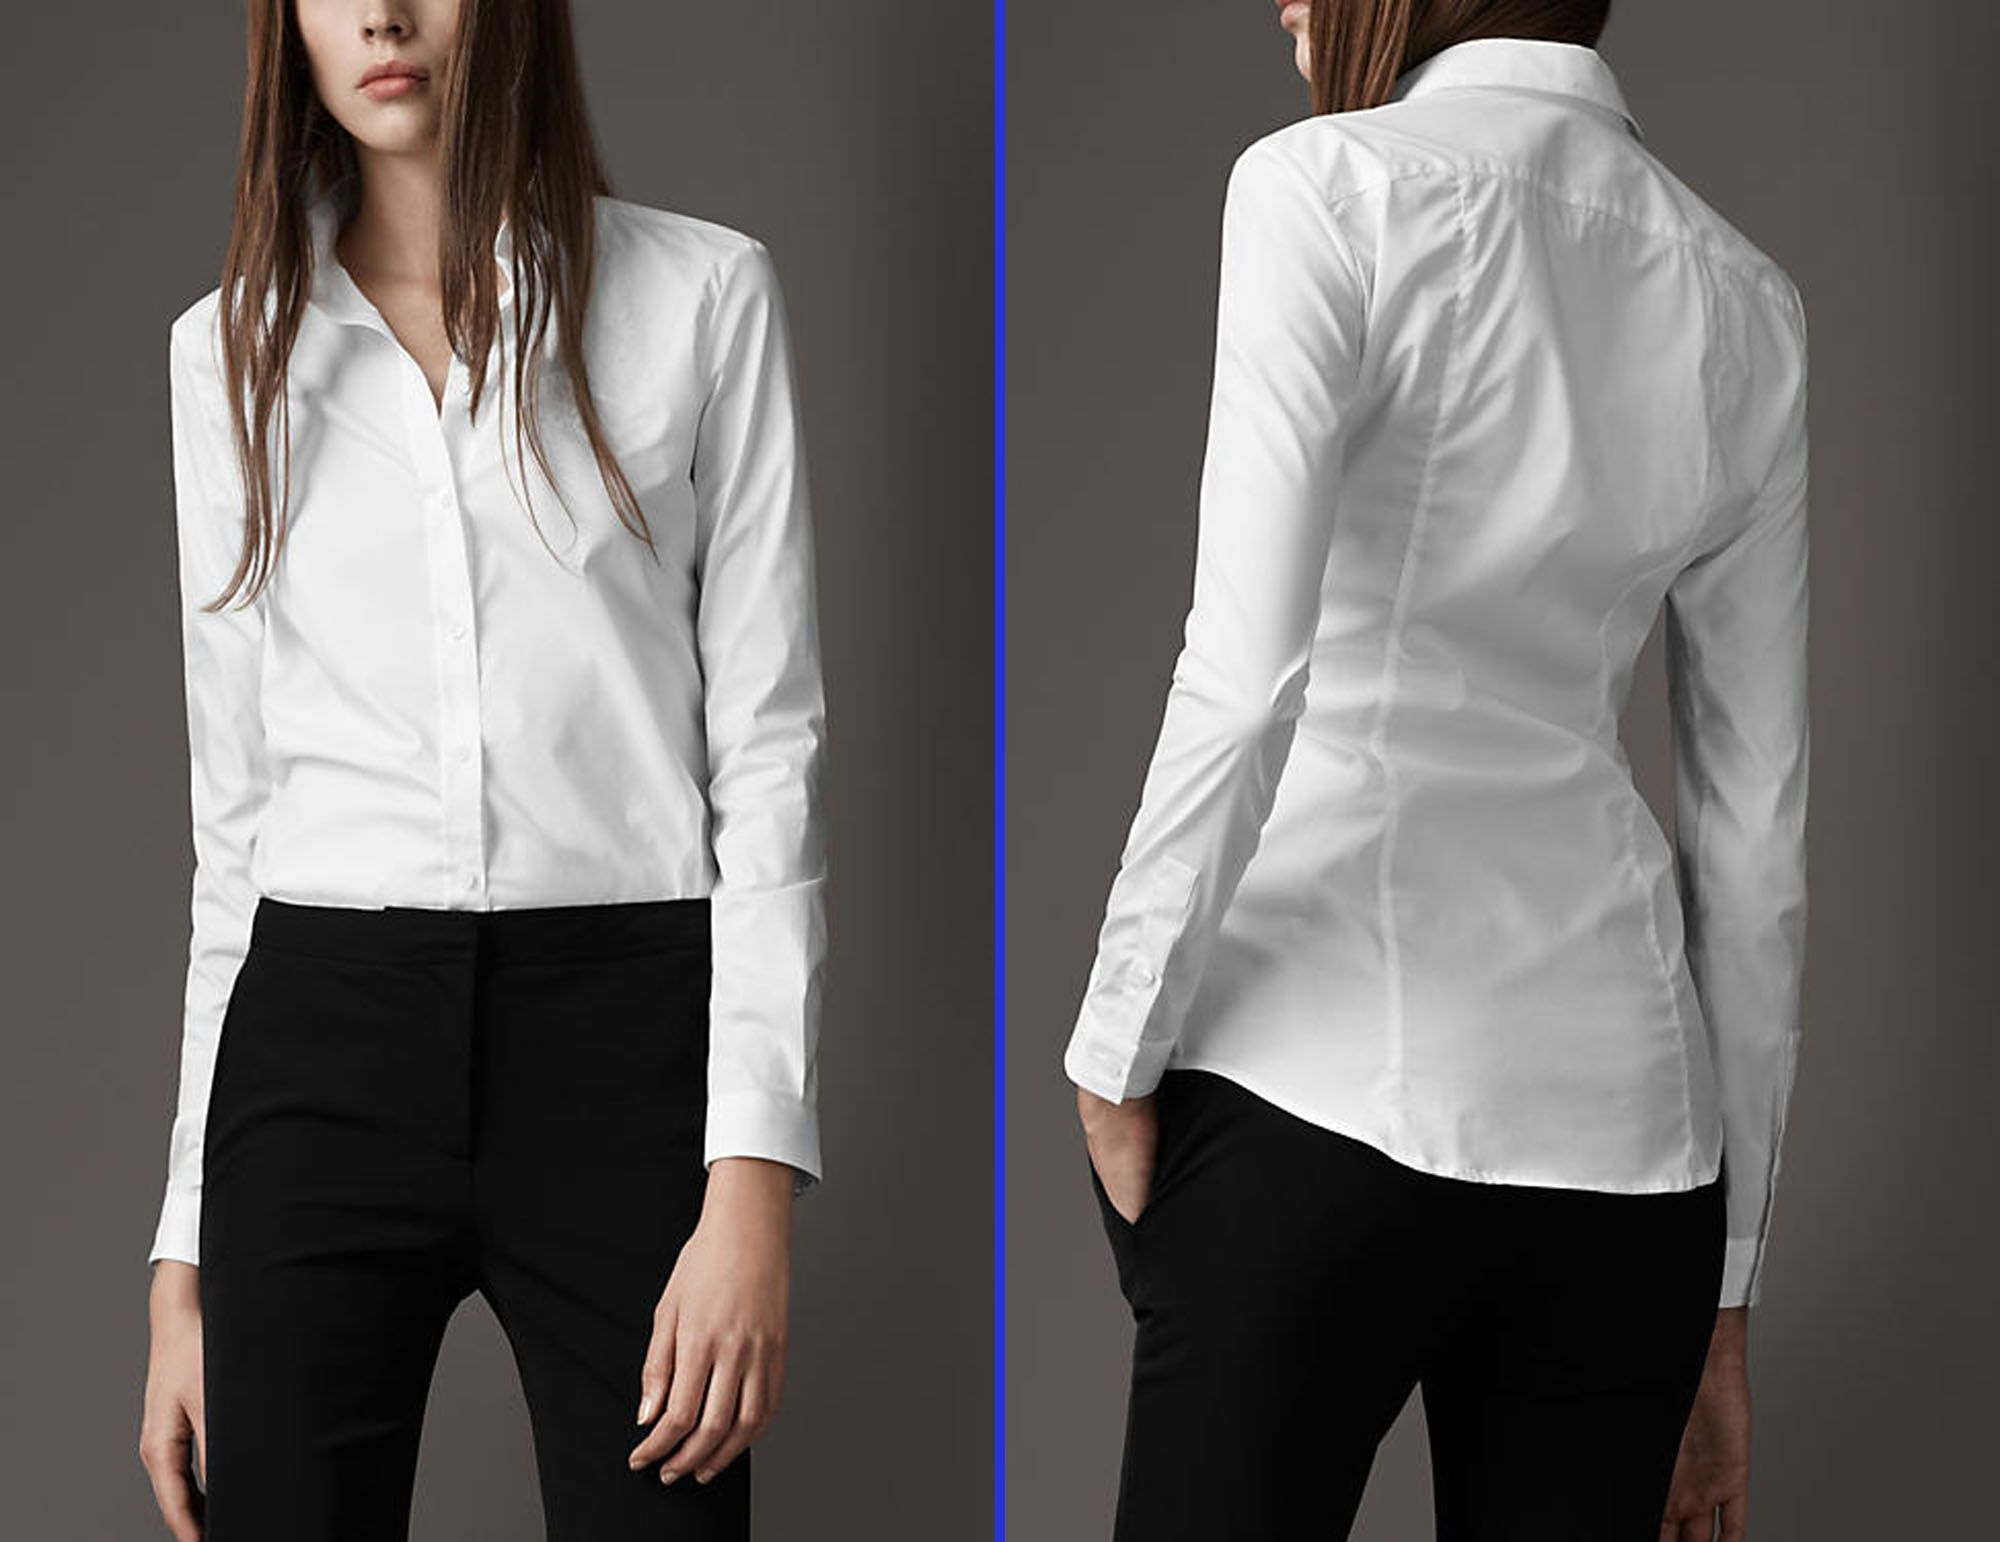 g7. women&-39-s shirt - Fashion &amp- Style - Pinterest - For women- Shirt ...